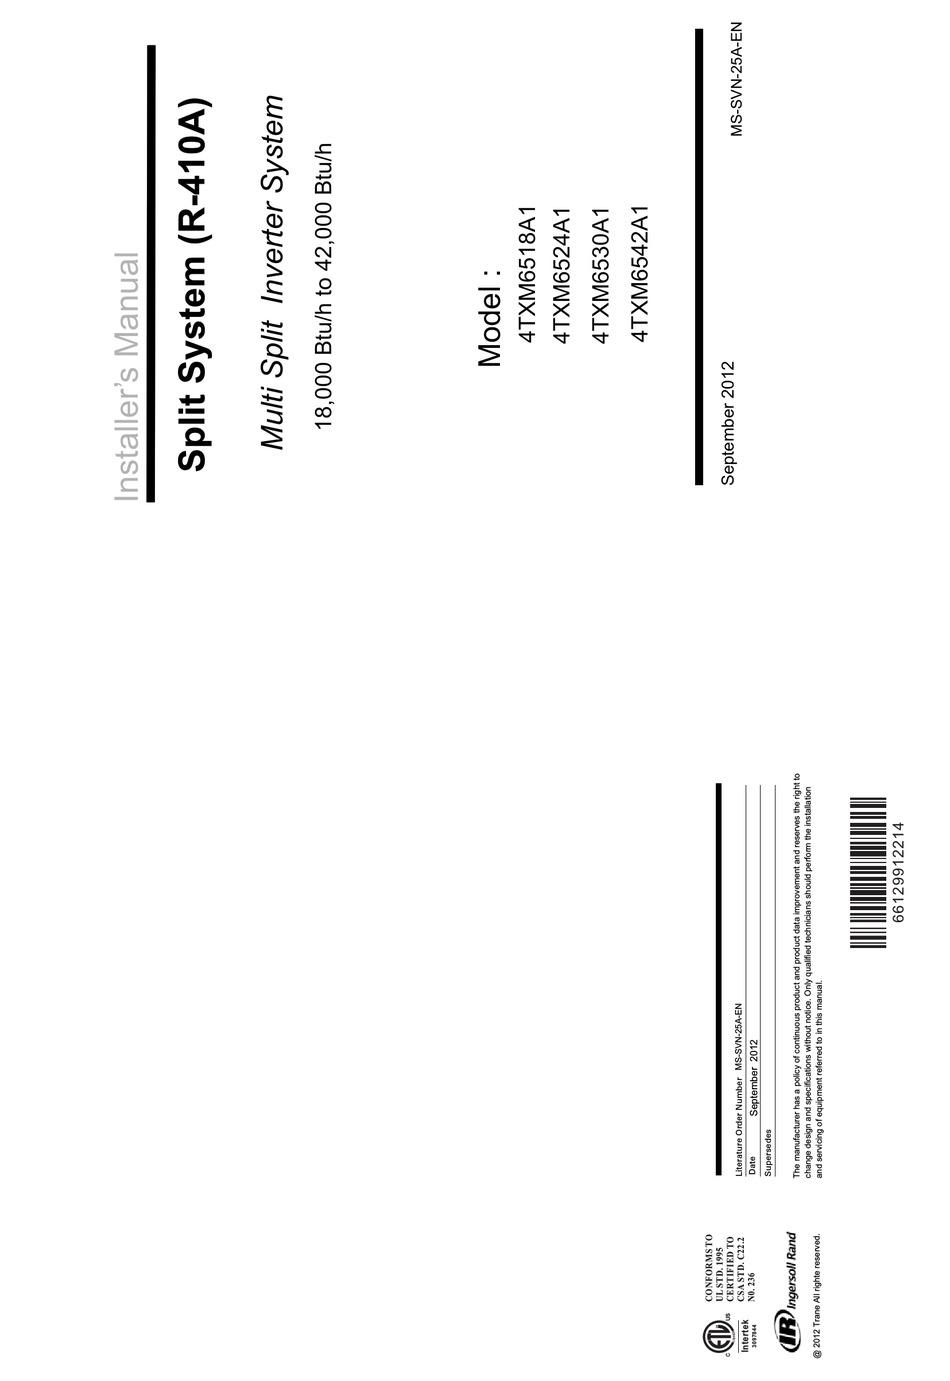 INGERSOLL-RAND 4TXM6518A1 INSTALLER MANUAL Pdf Download